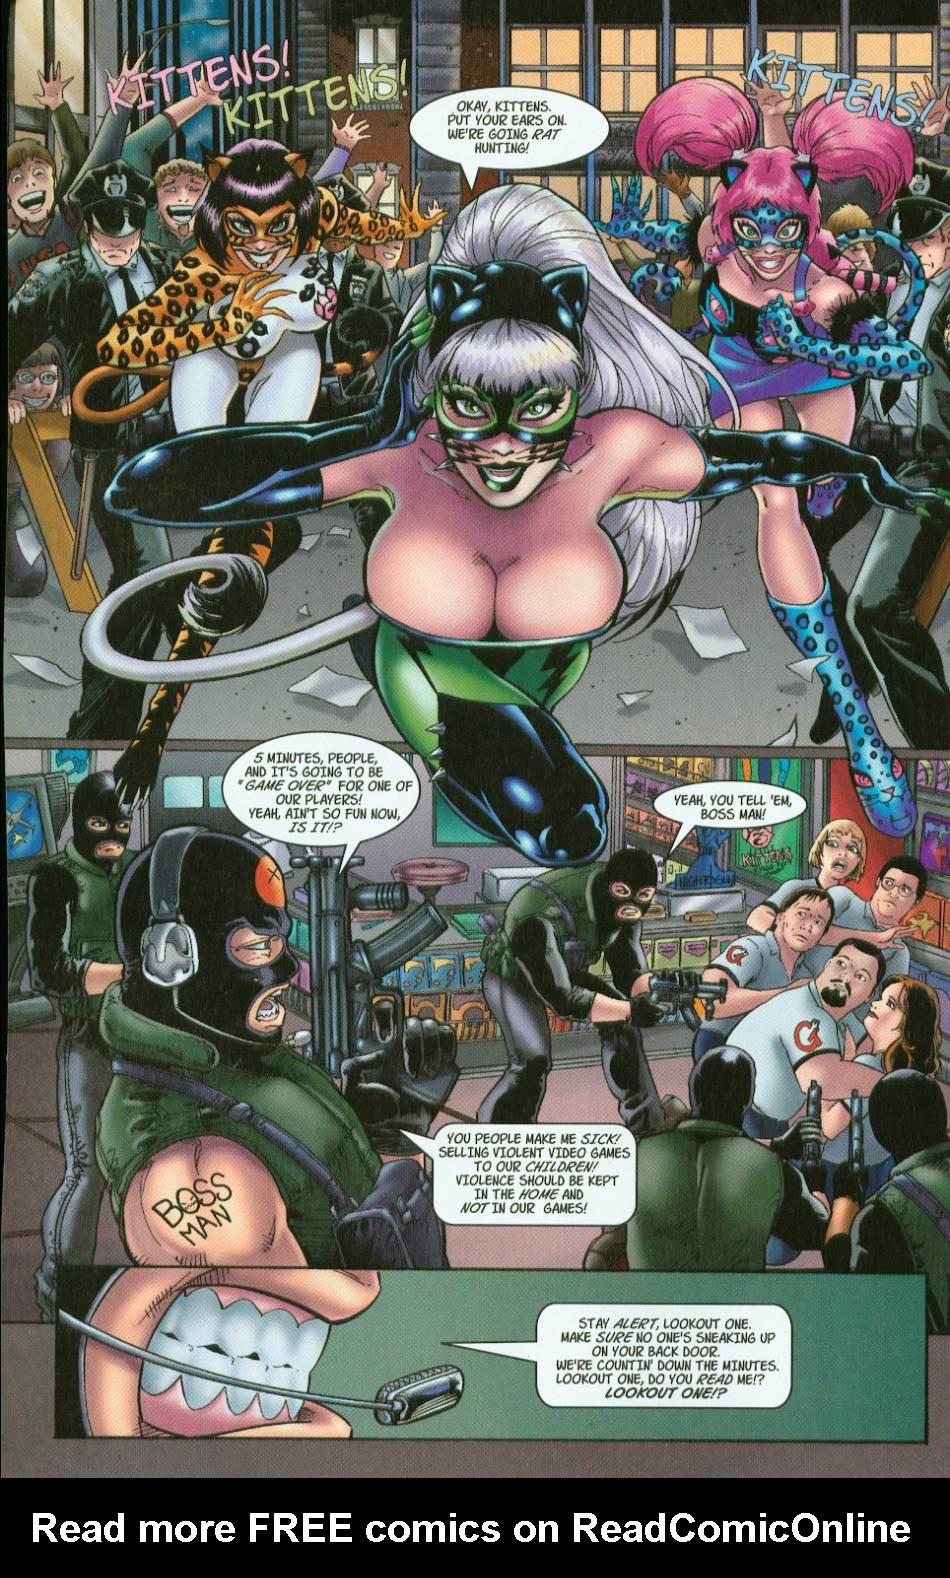 Read online 3 Little Kittens: Purrr-fect Weapons comic -  Issue #1 - 6